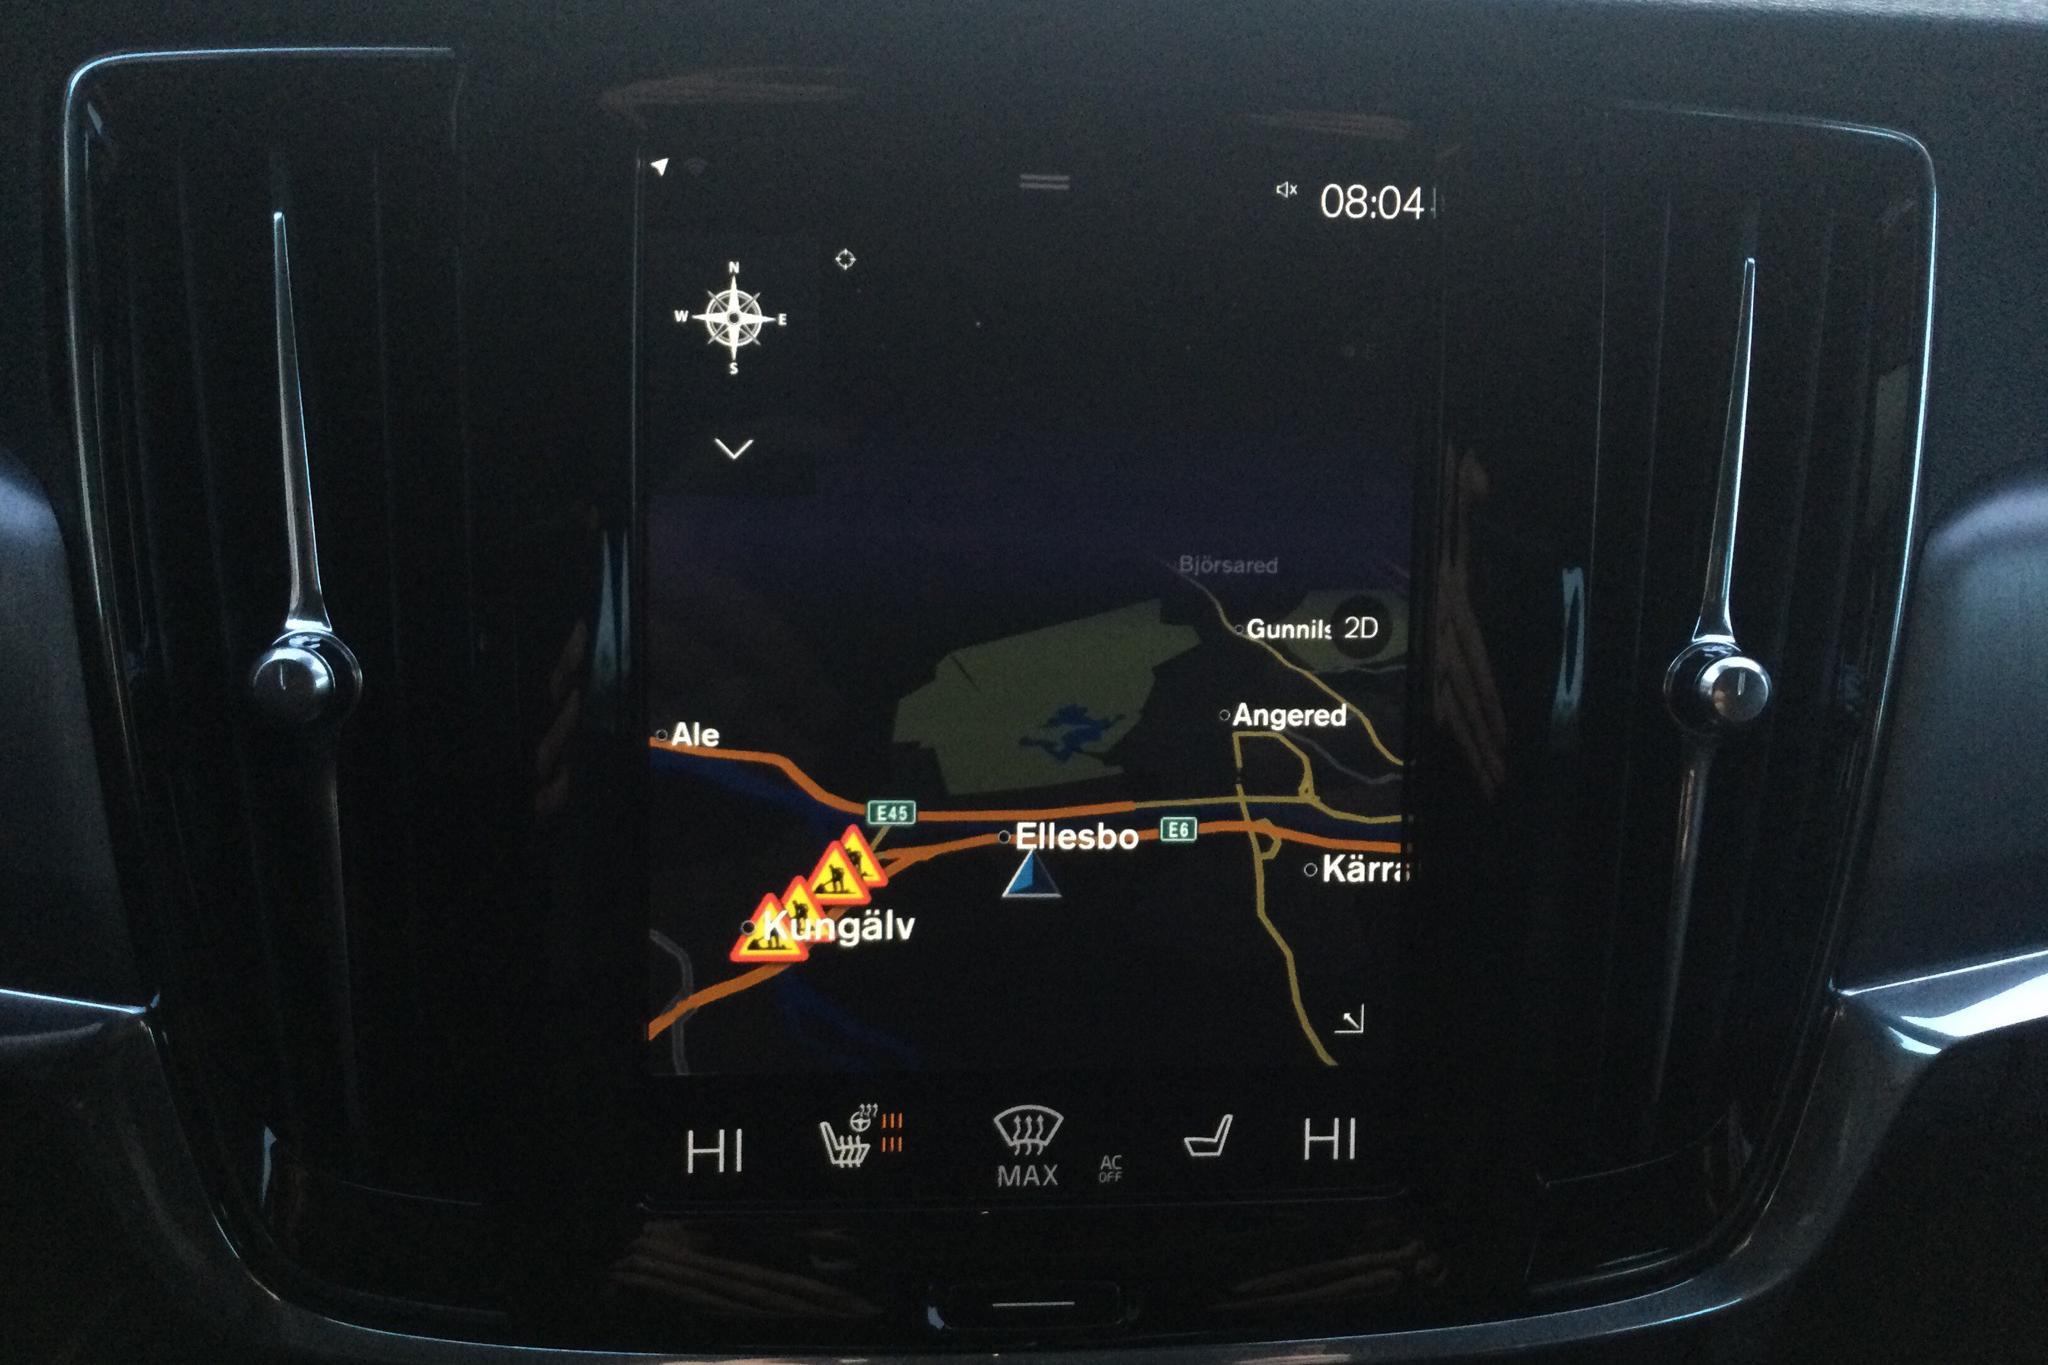 Volvo V90 D4 (190hk) - 62 640 km - Automatic - black - 2018